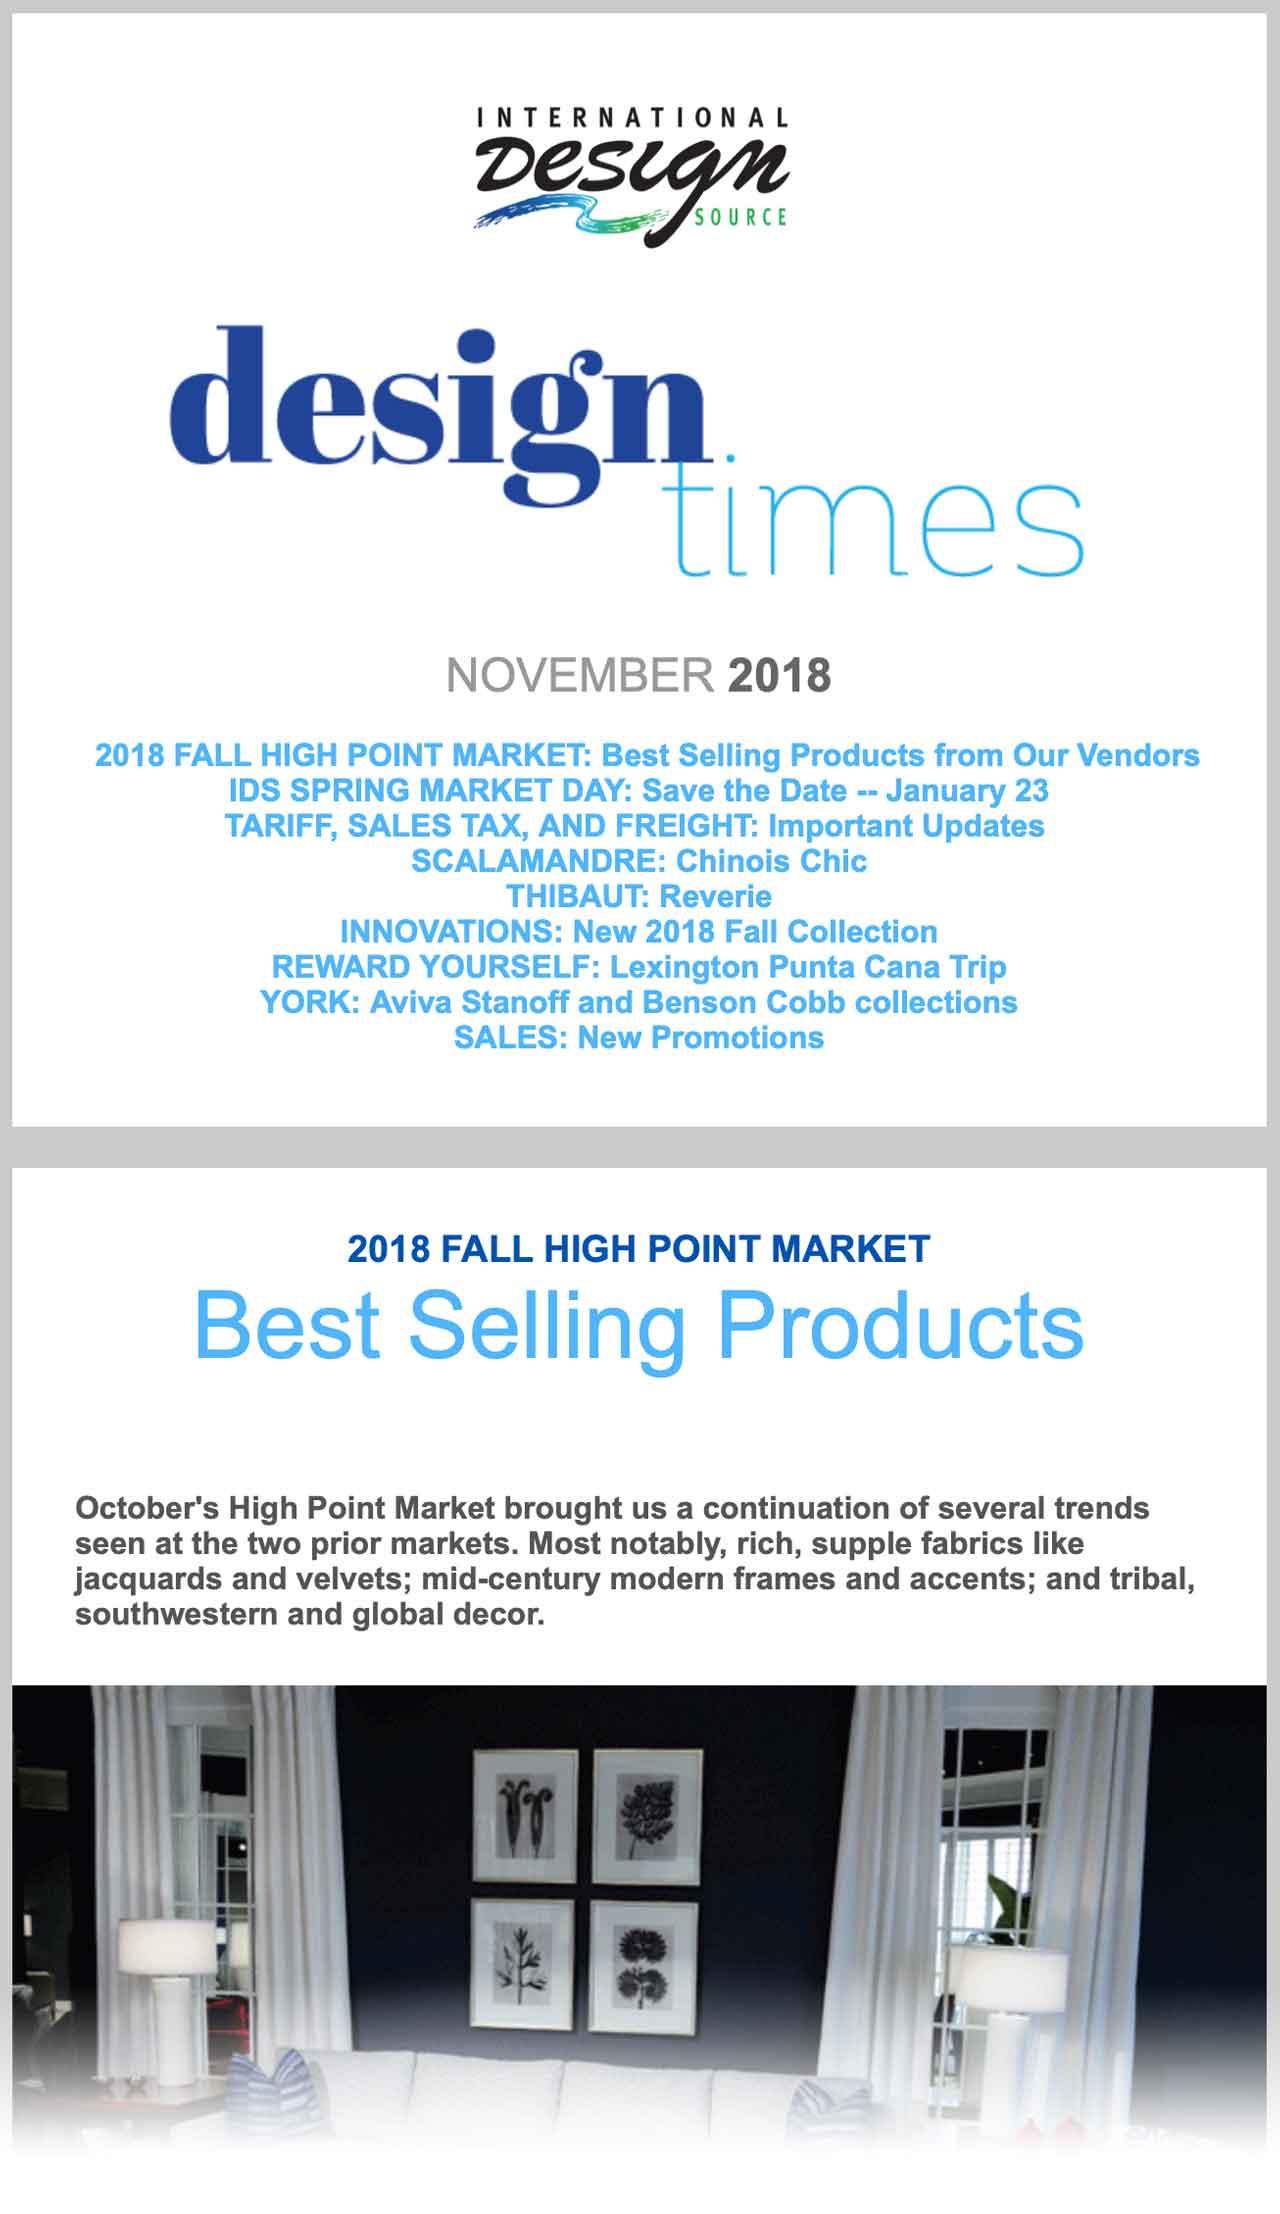 DESIGN-TIMES-November2018